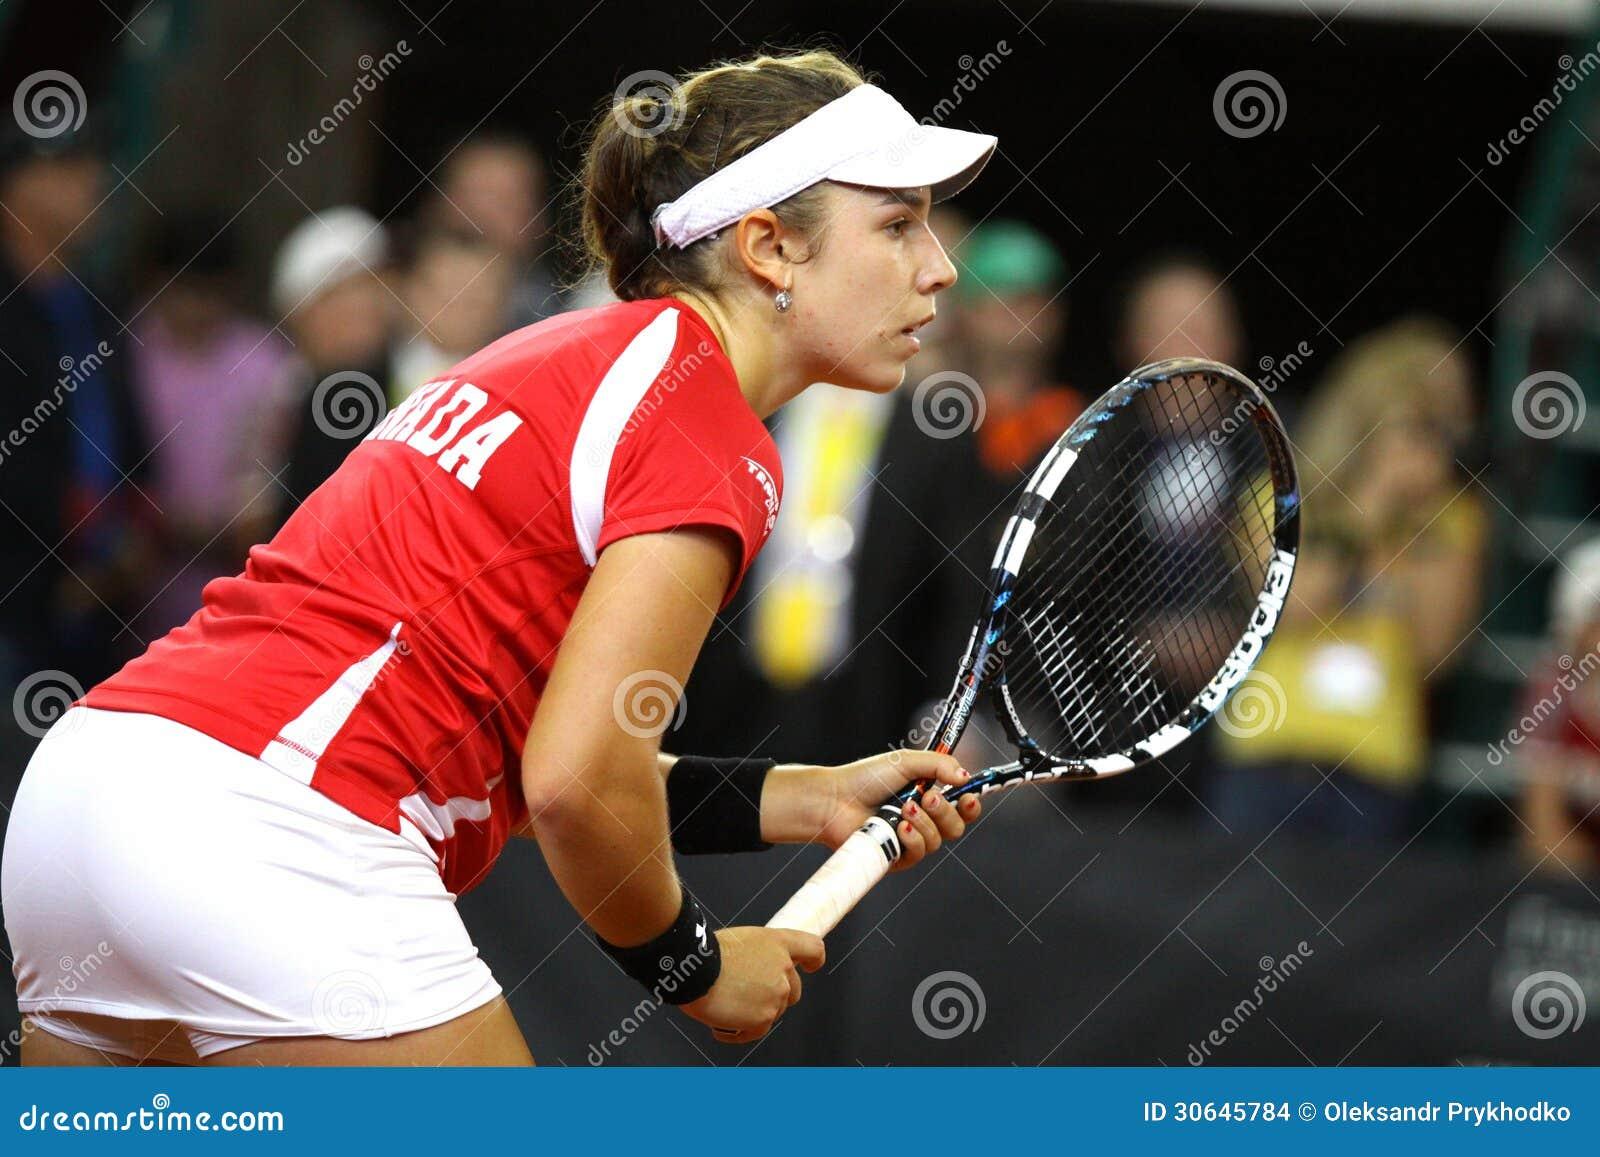 fedcup tennis game ukraine vs canada editorial stock image image 30645784. Black Bedroom Furniture Sets. Home Design Ideas